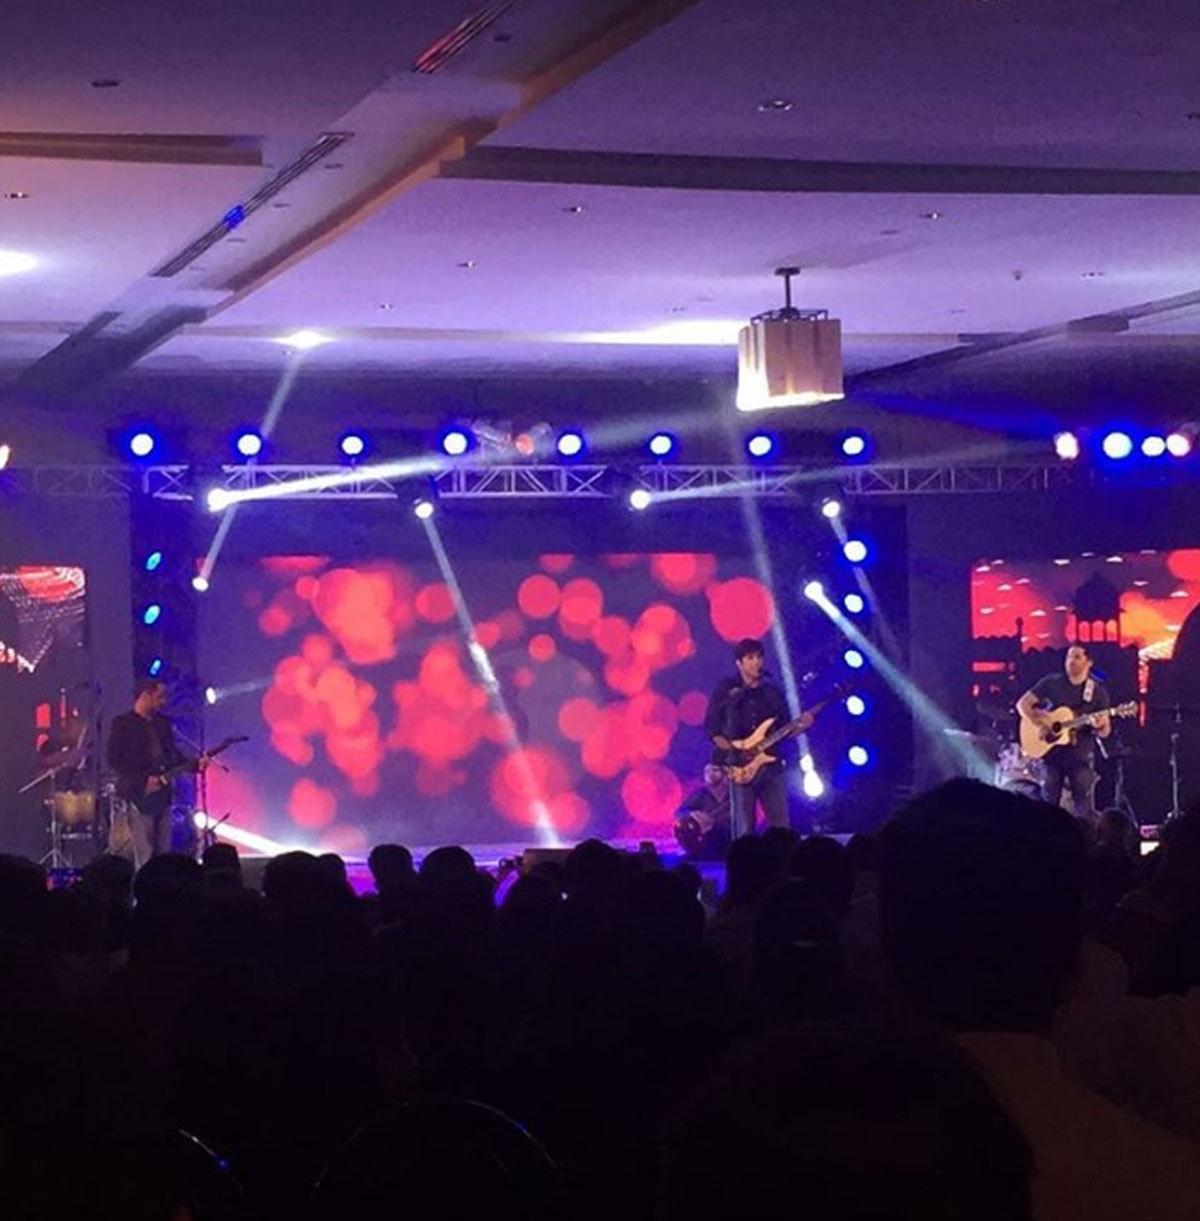 Noori performaing at the event. Photo: Instagram @alayhussain